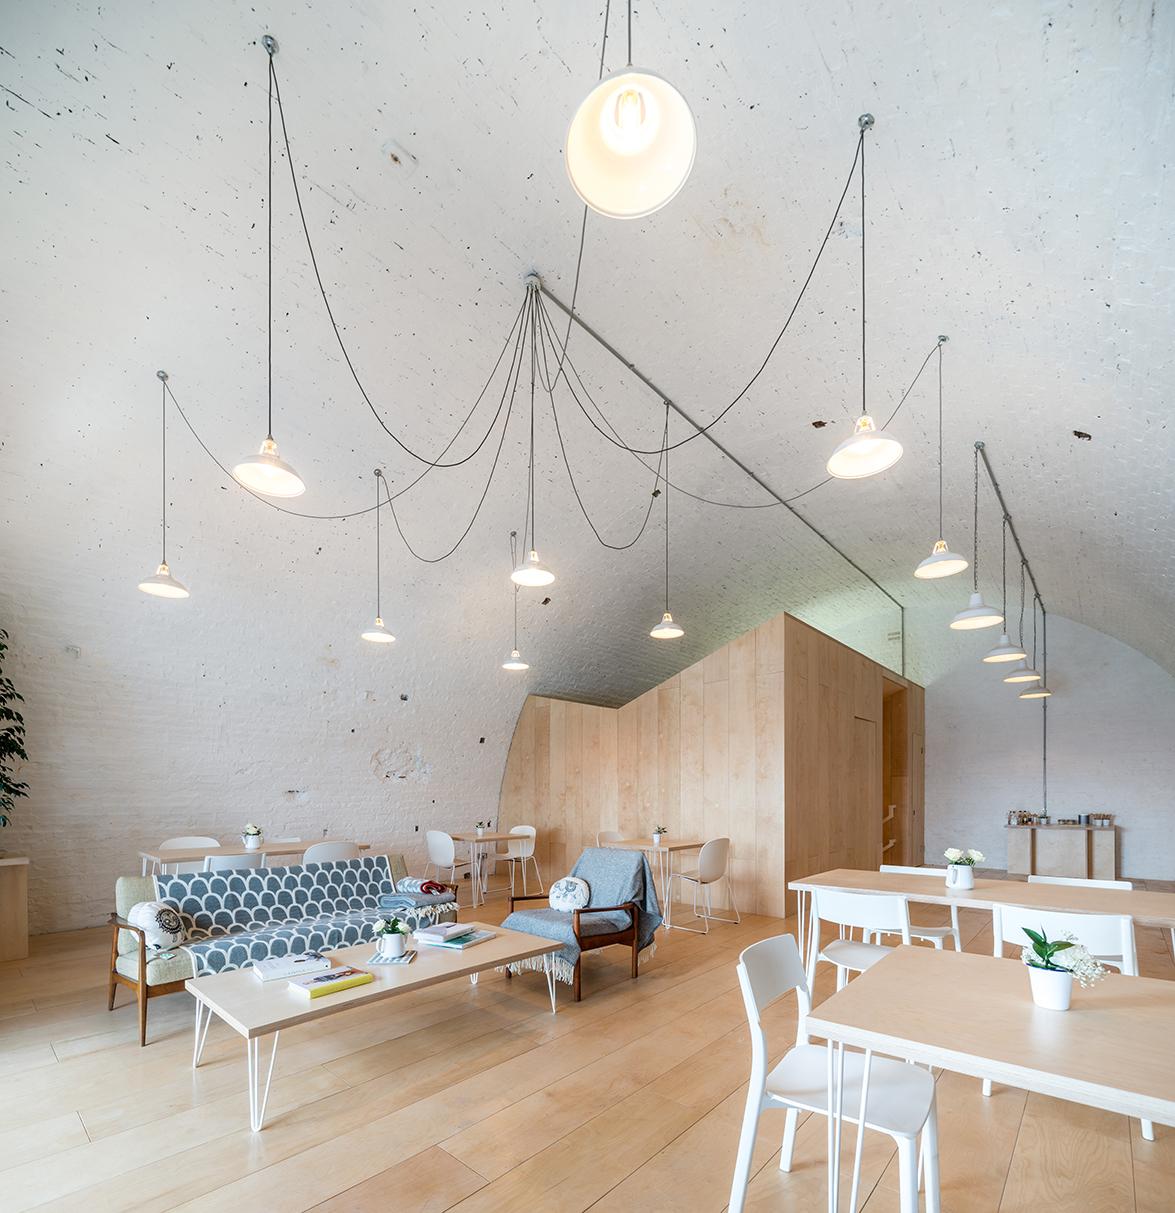 archive-homestore-and-kitchen-ramsgate-uk-haptic-architects-1